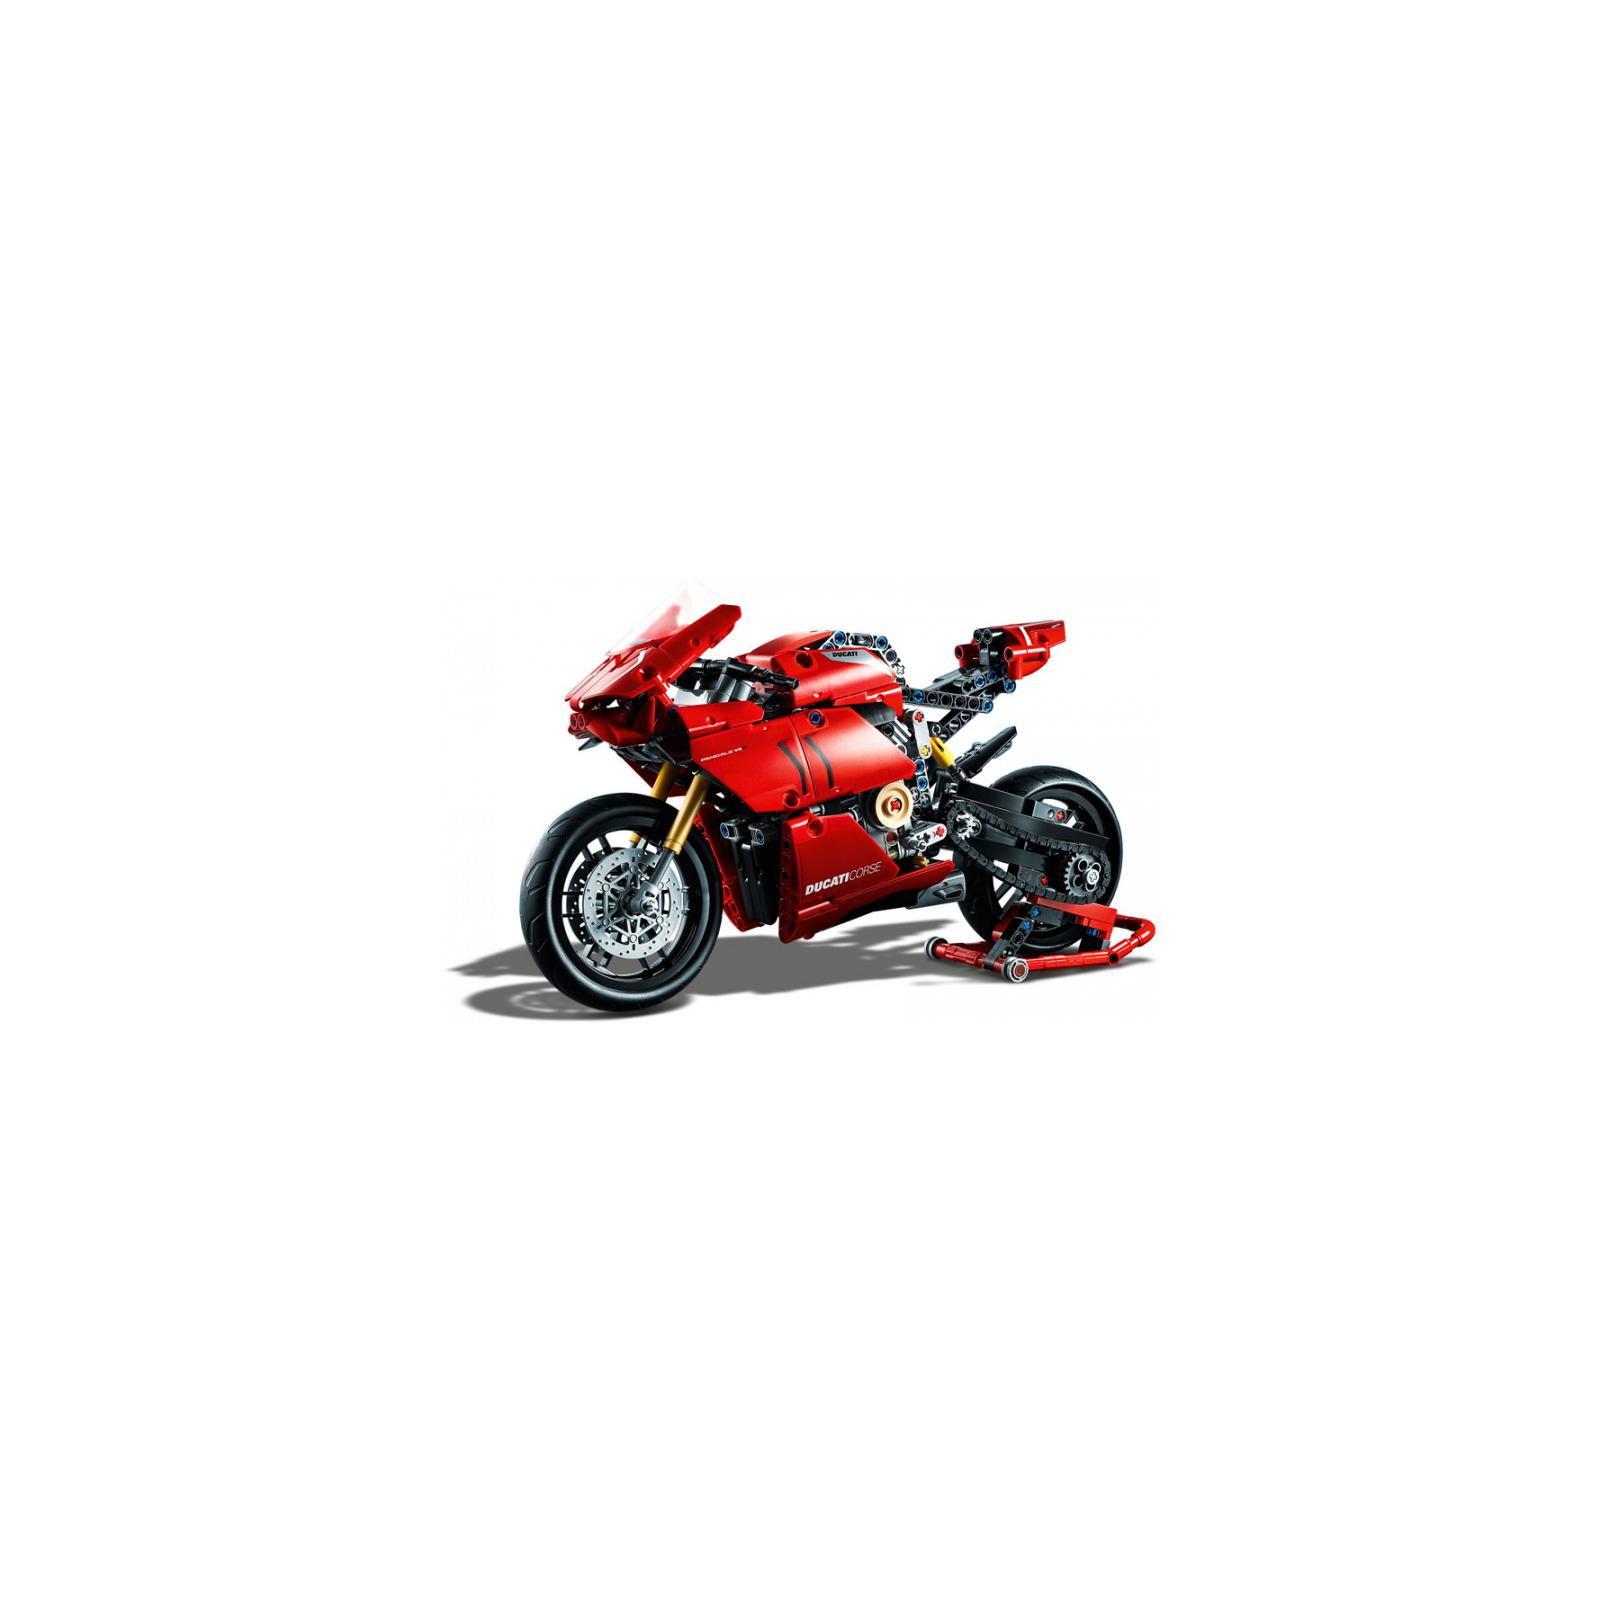 Конструктор LEGO Technic Ducati Panigale V4 R 0 646 детали (42107) изображение 4